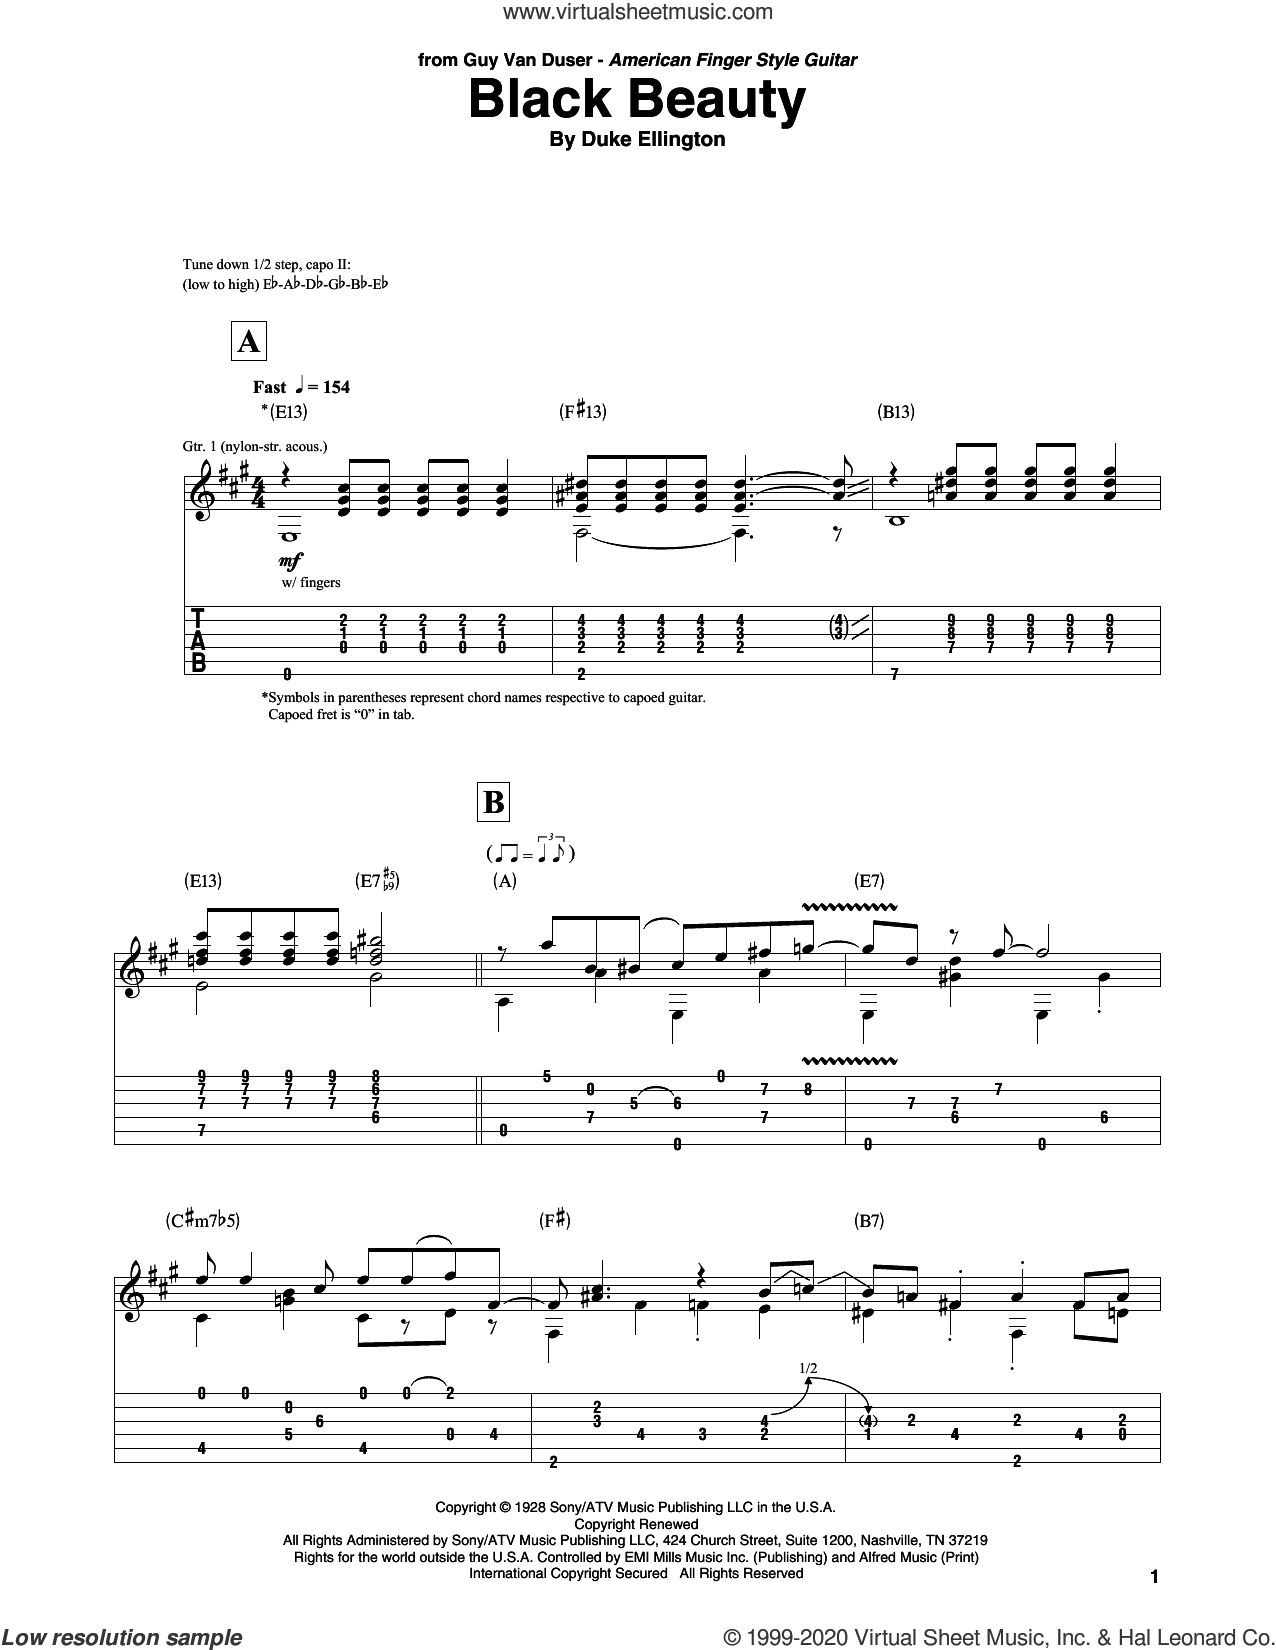 Black Beauty sheet music for guitar solo by Duke Ellington, intermediate skill level